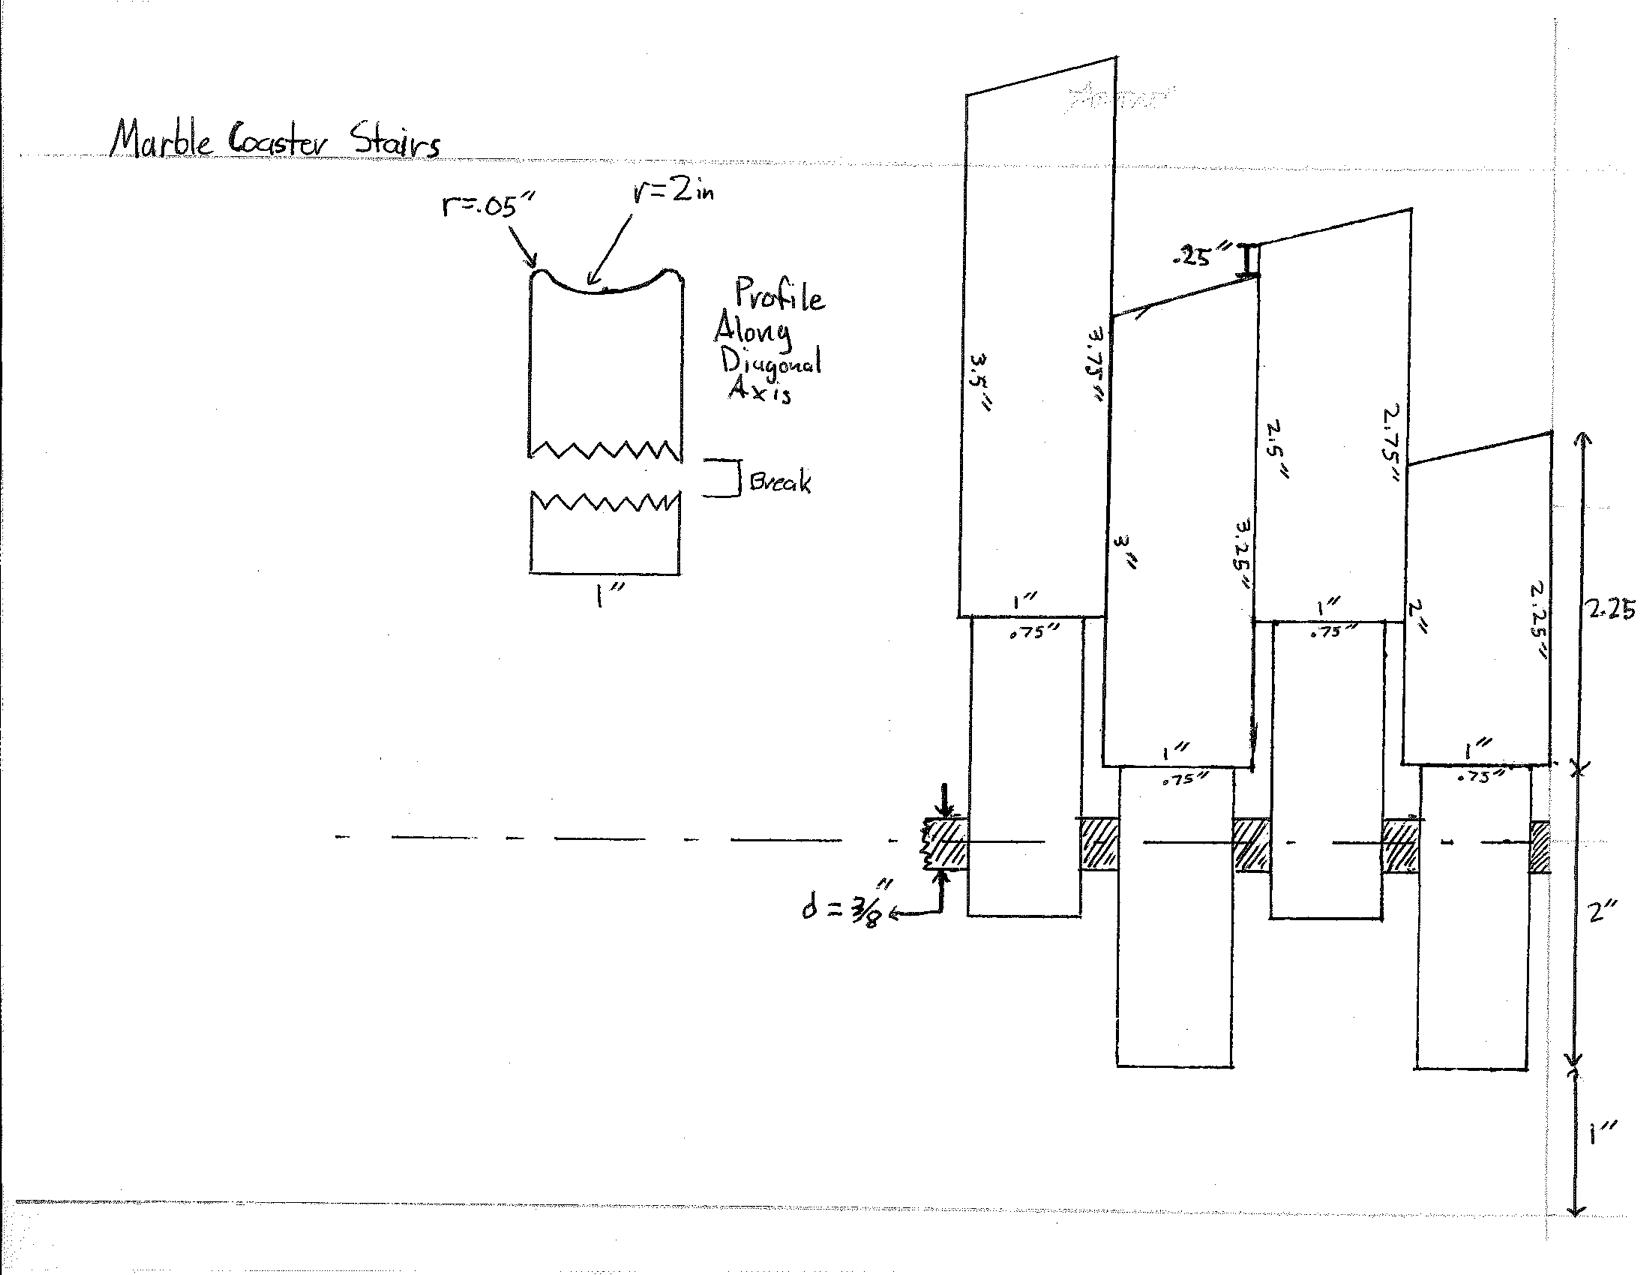 Alexander Murphy Marble Rollercoaster Diagram